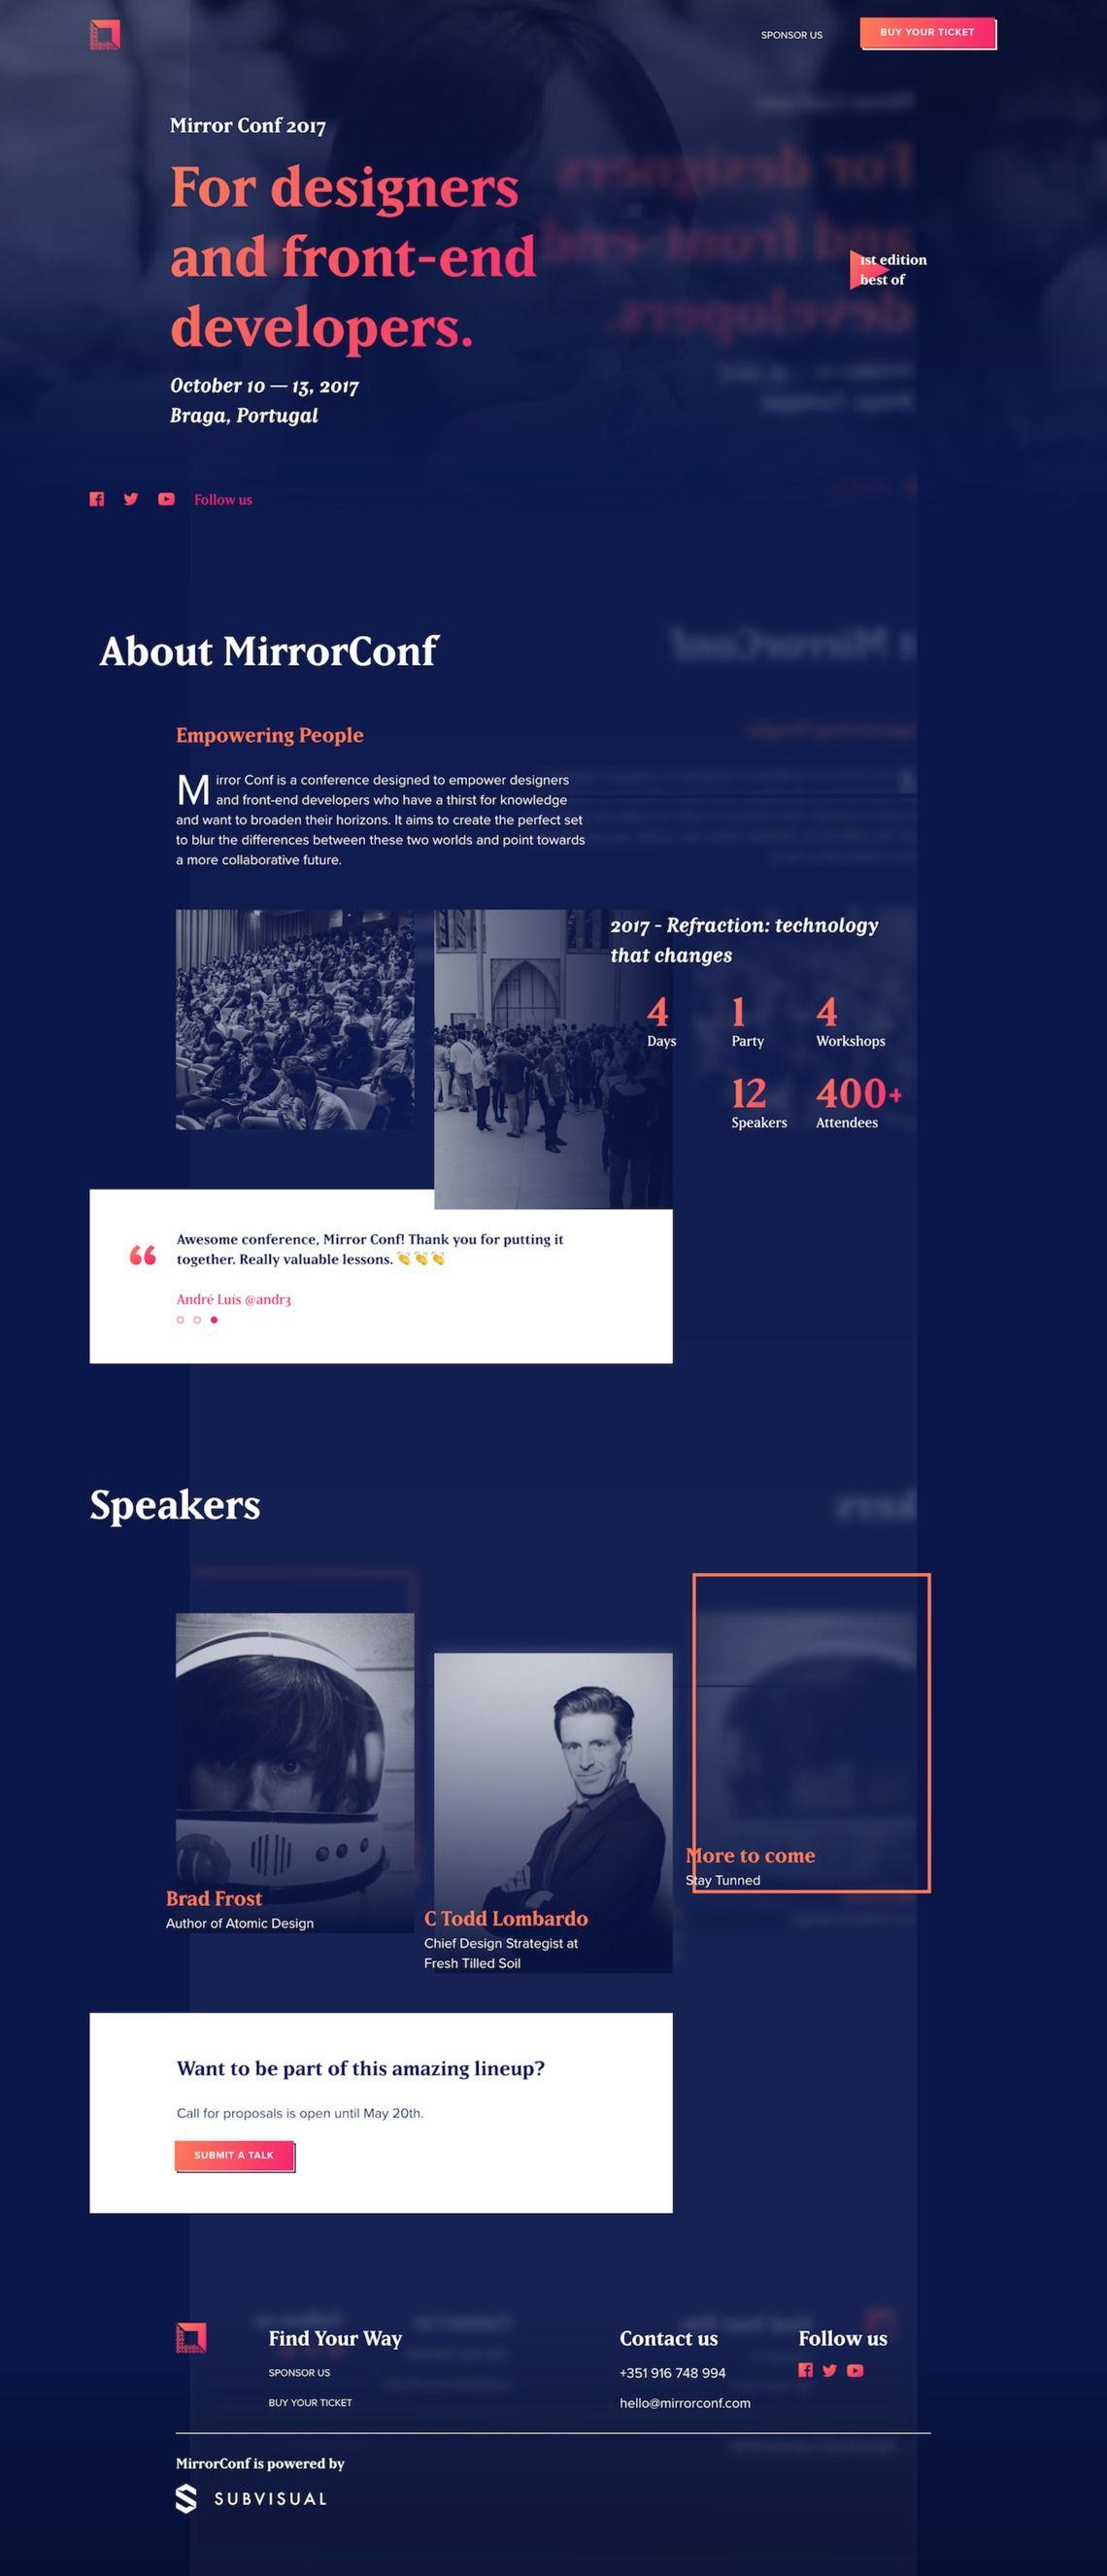 Mirror Conf 2017 A Design And Front End Development Conference Web Layout Design Conference Design Web Design